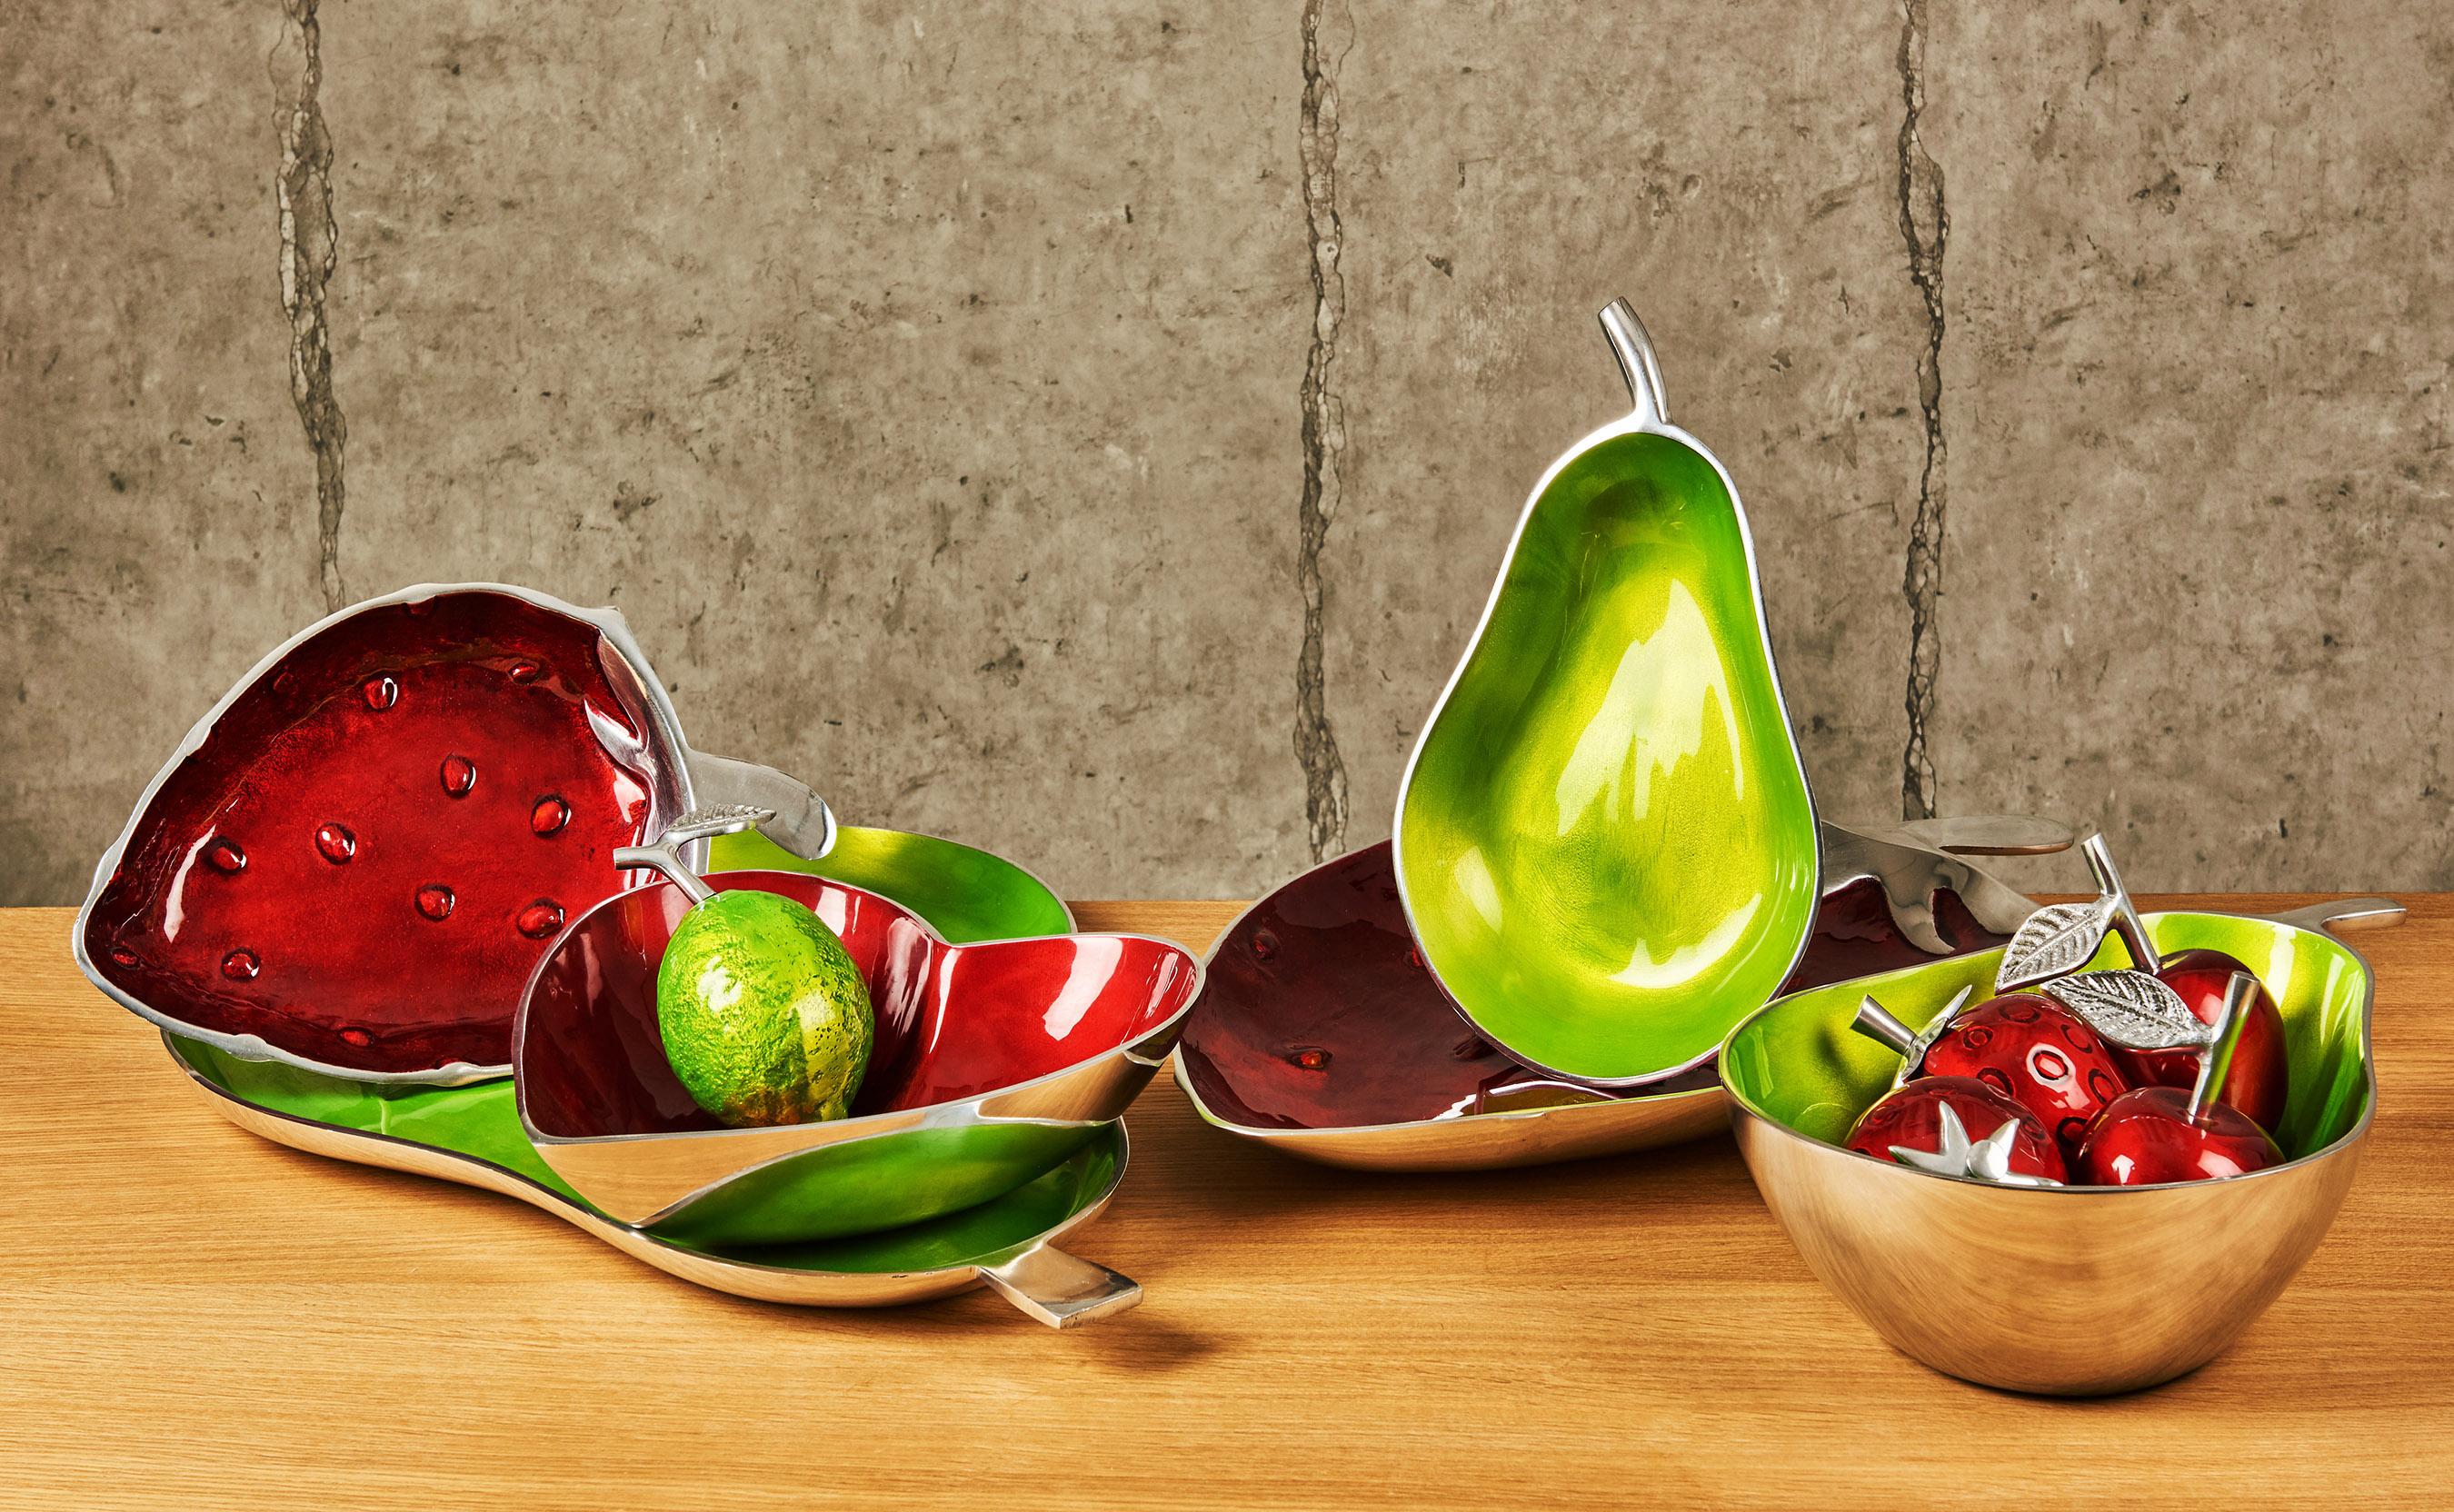 Colourful Enamelled Bowls